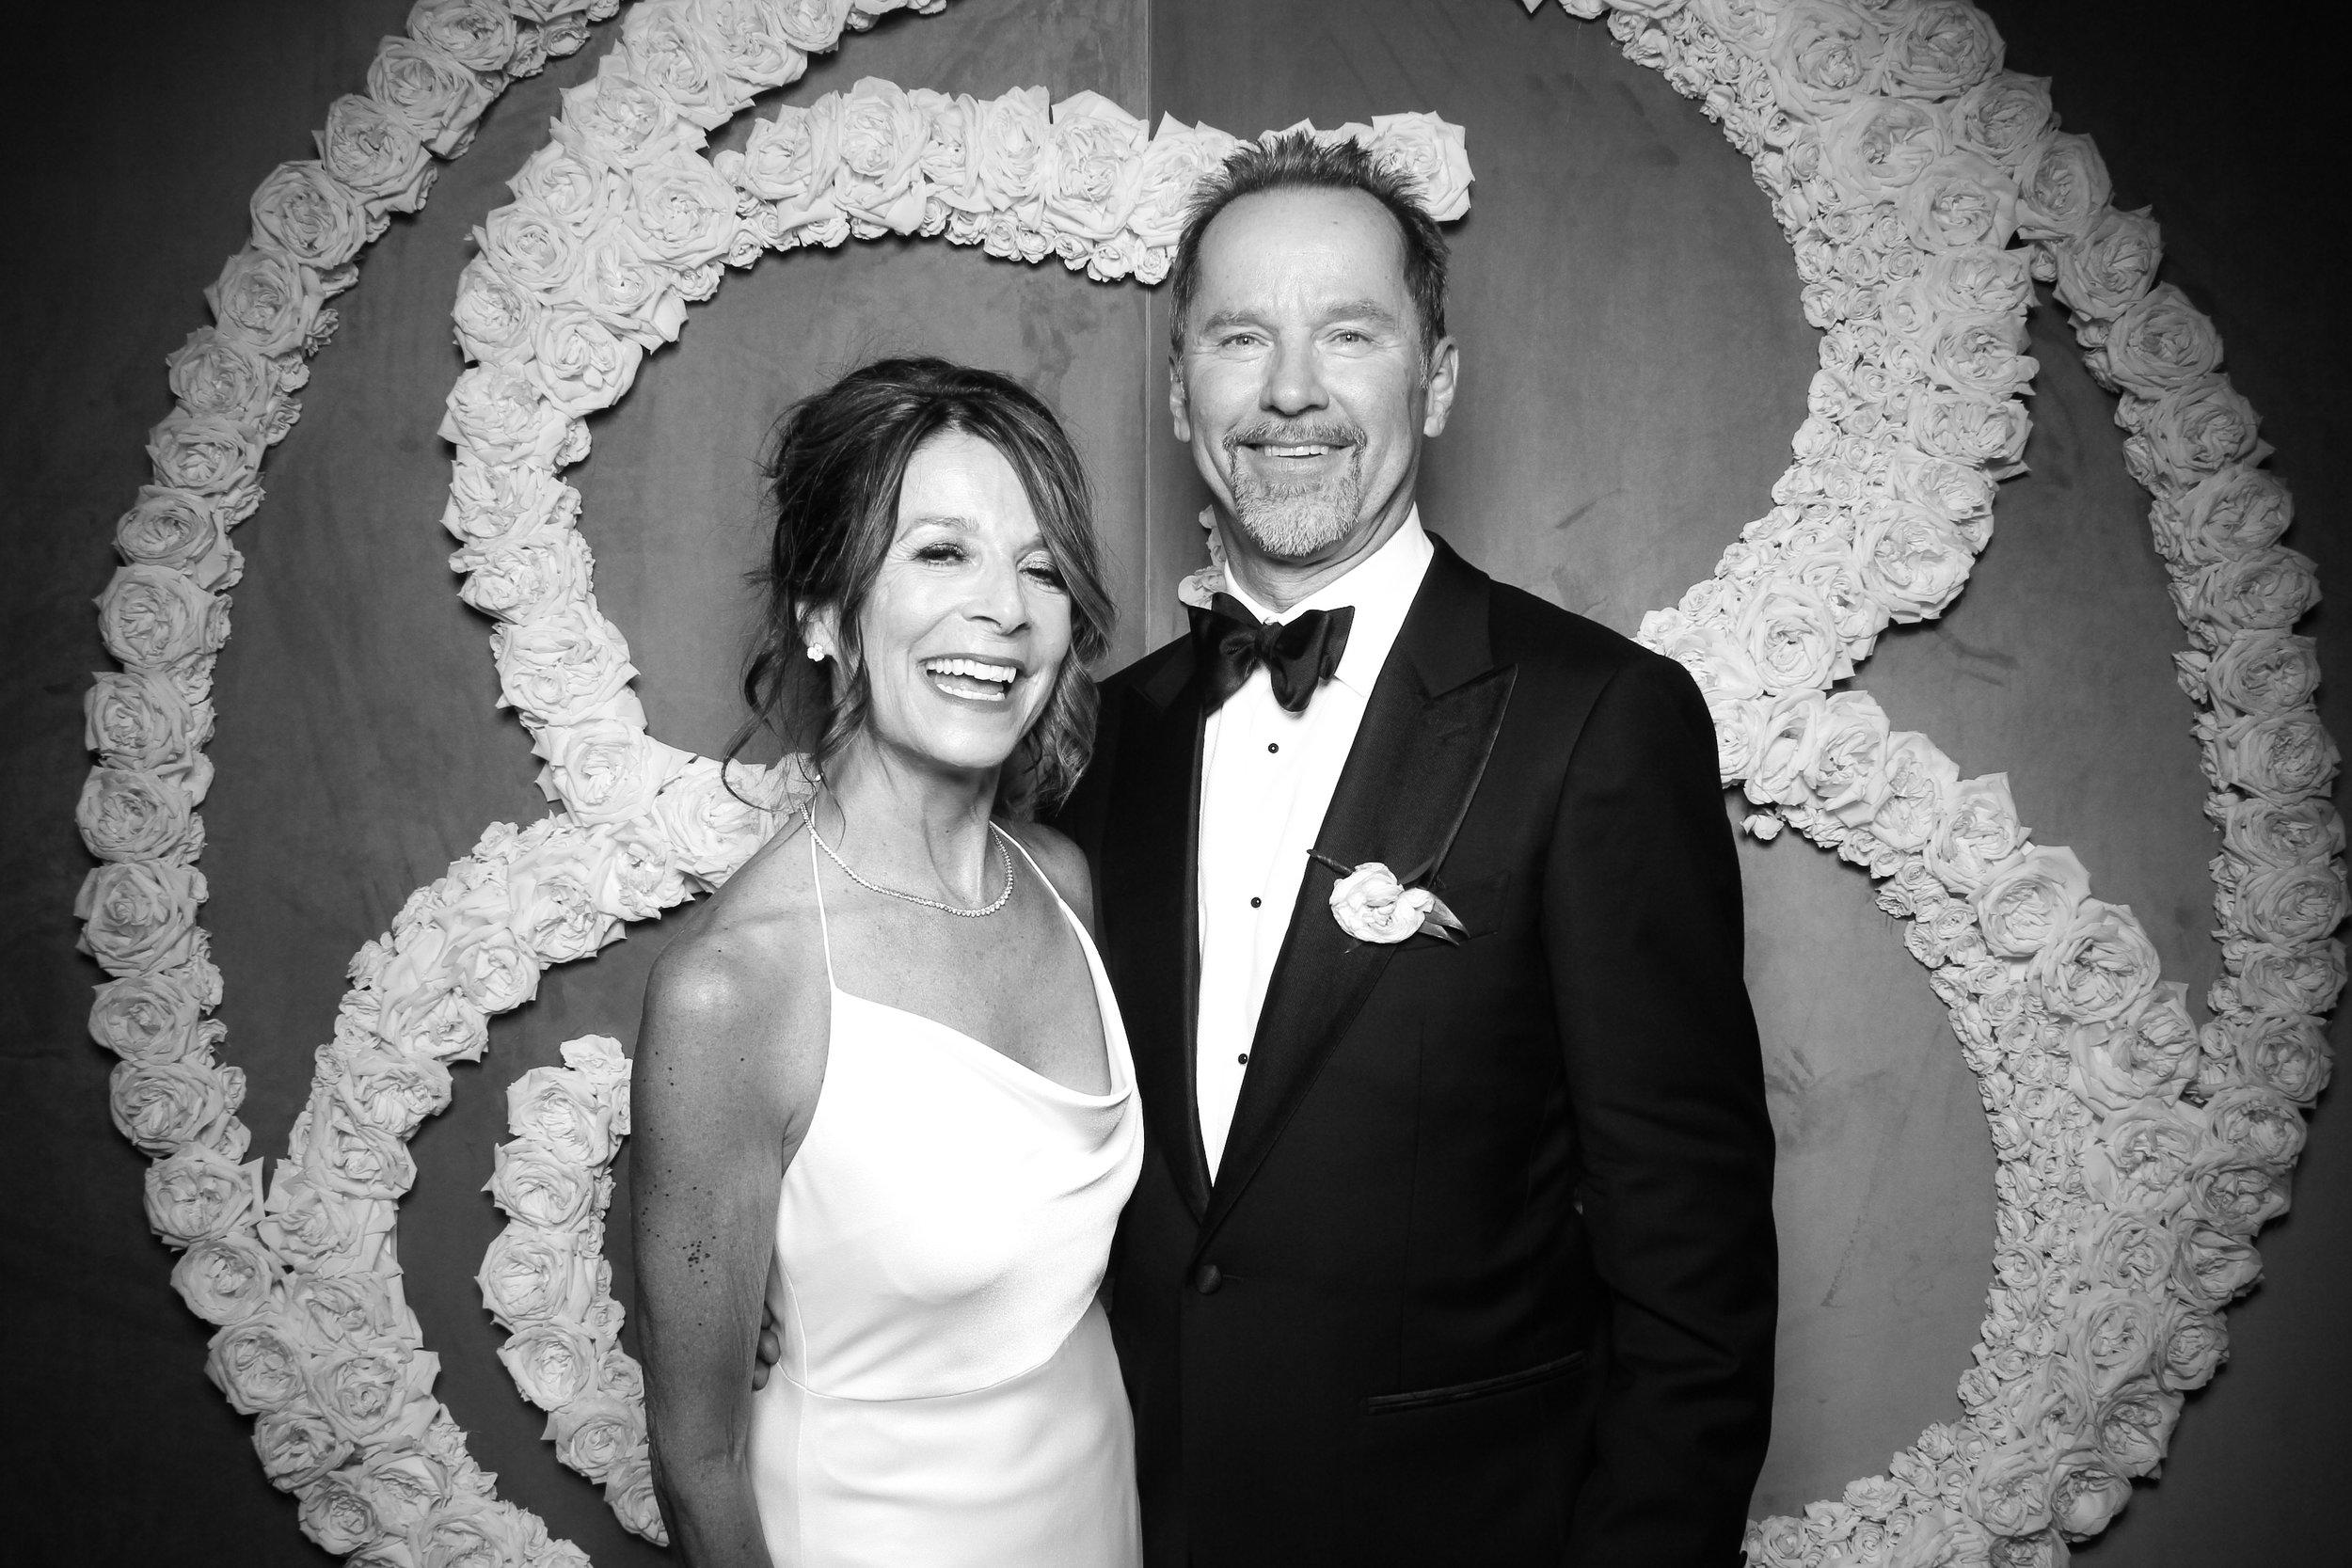 Photo_Booth_Rental_At_Standard_Club_Wedding_Chicago_18.jpg